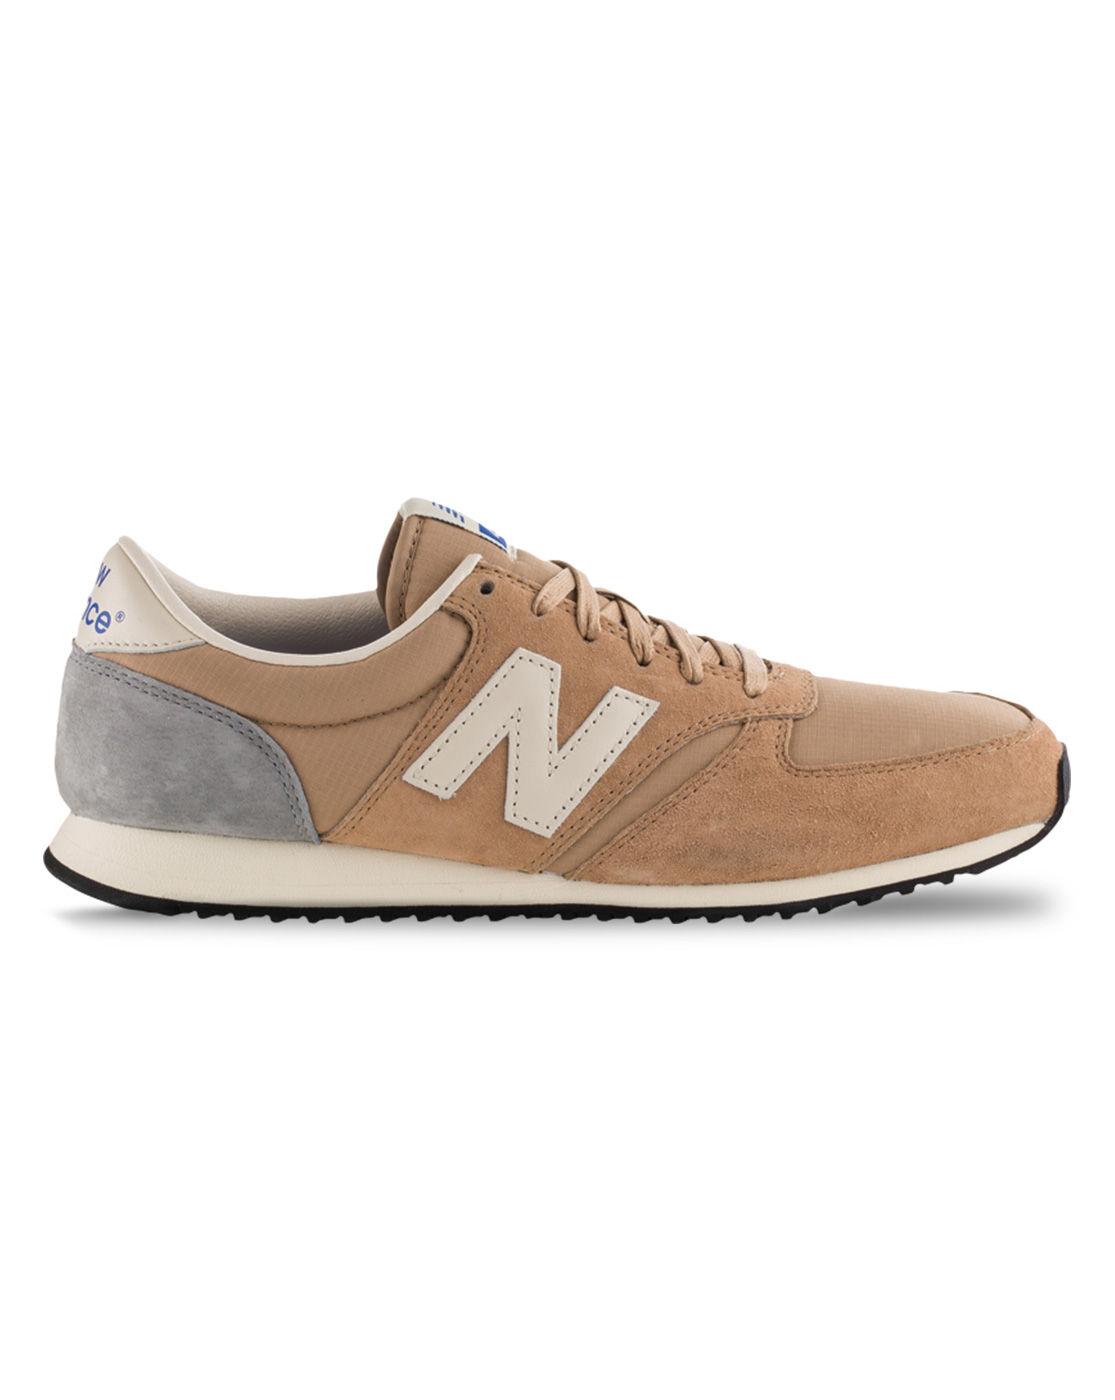 new balance u420 beige suede sneakers in brown for men beige lyst. Black Bedroom Furniture Sets. Home Design Ideas